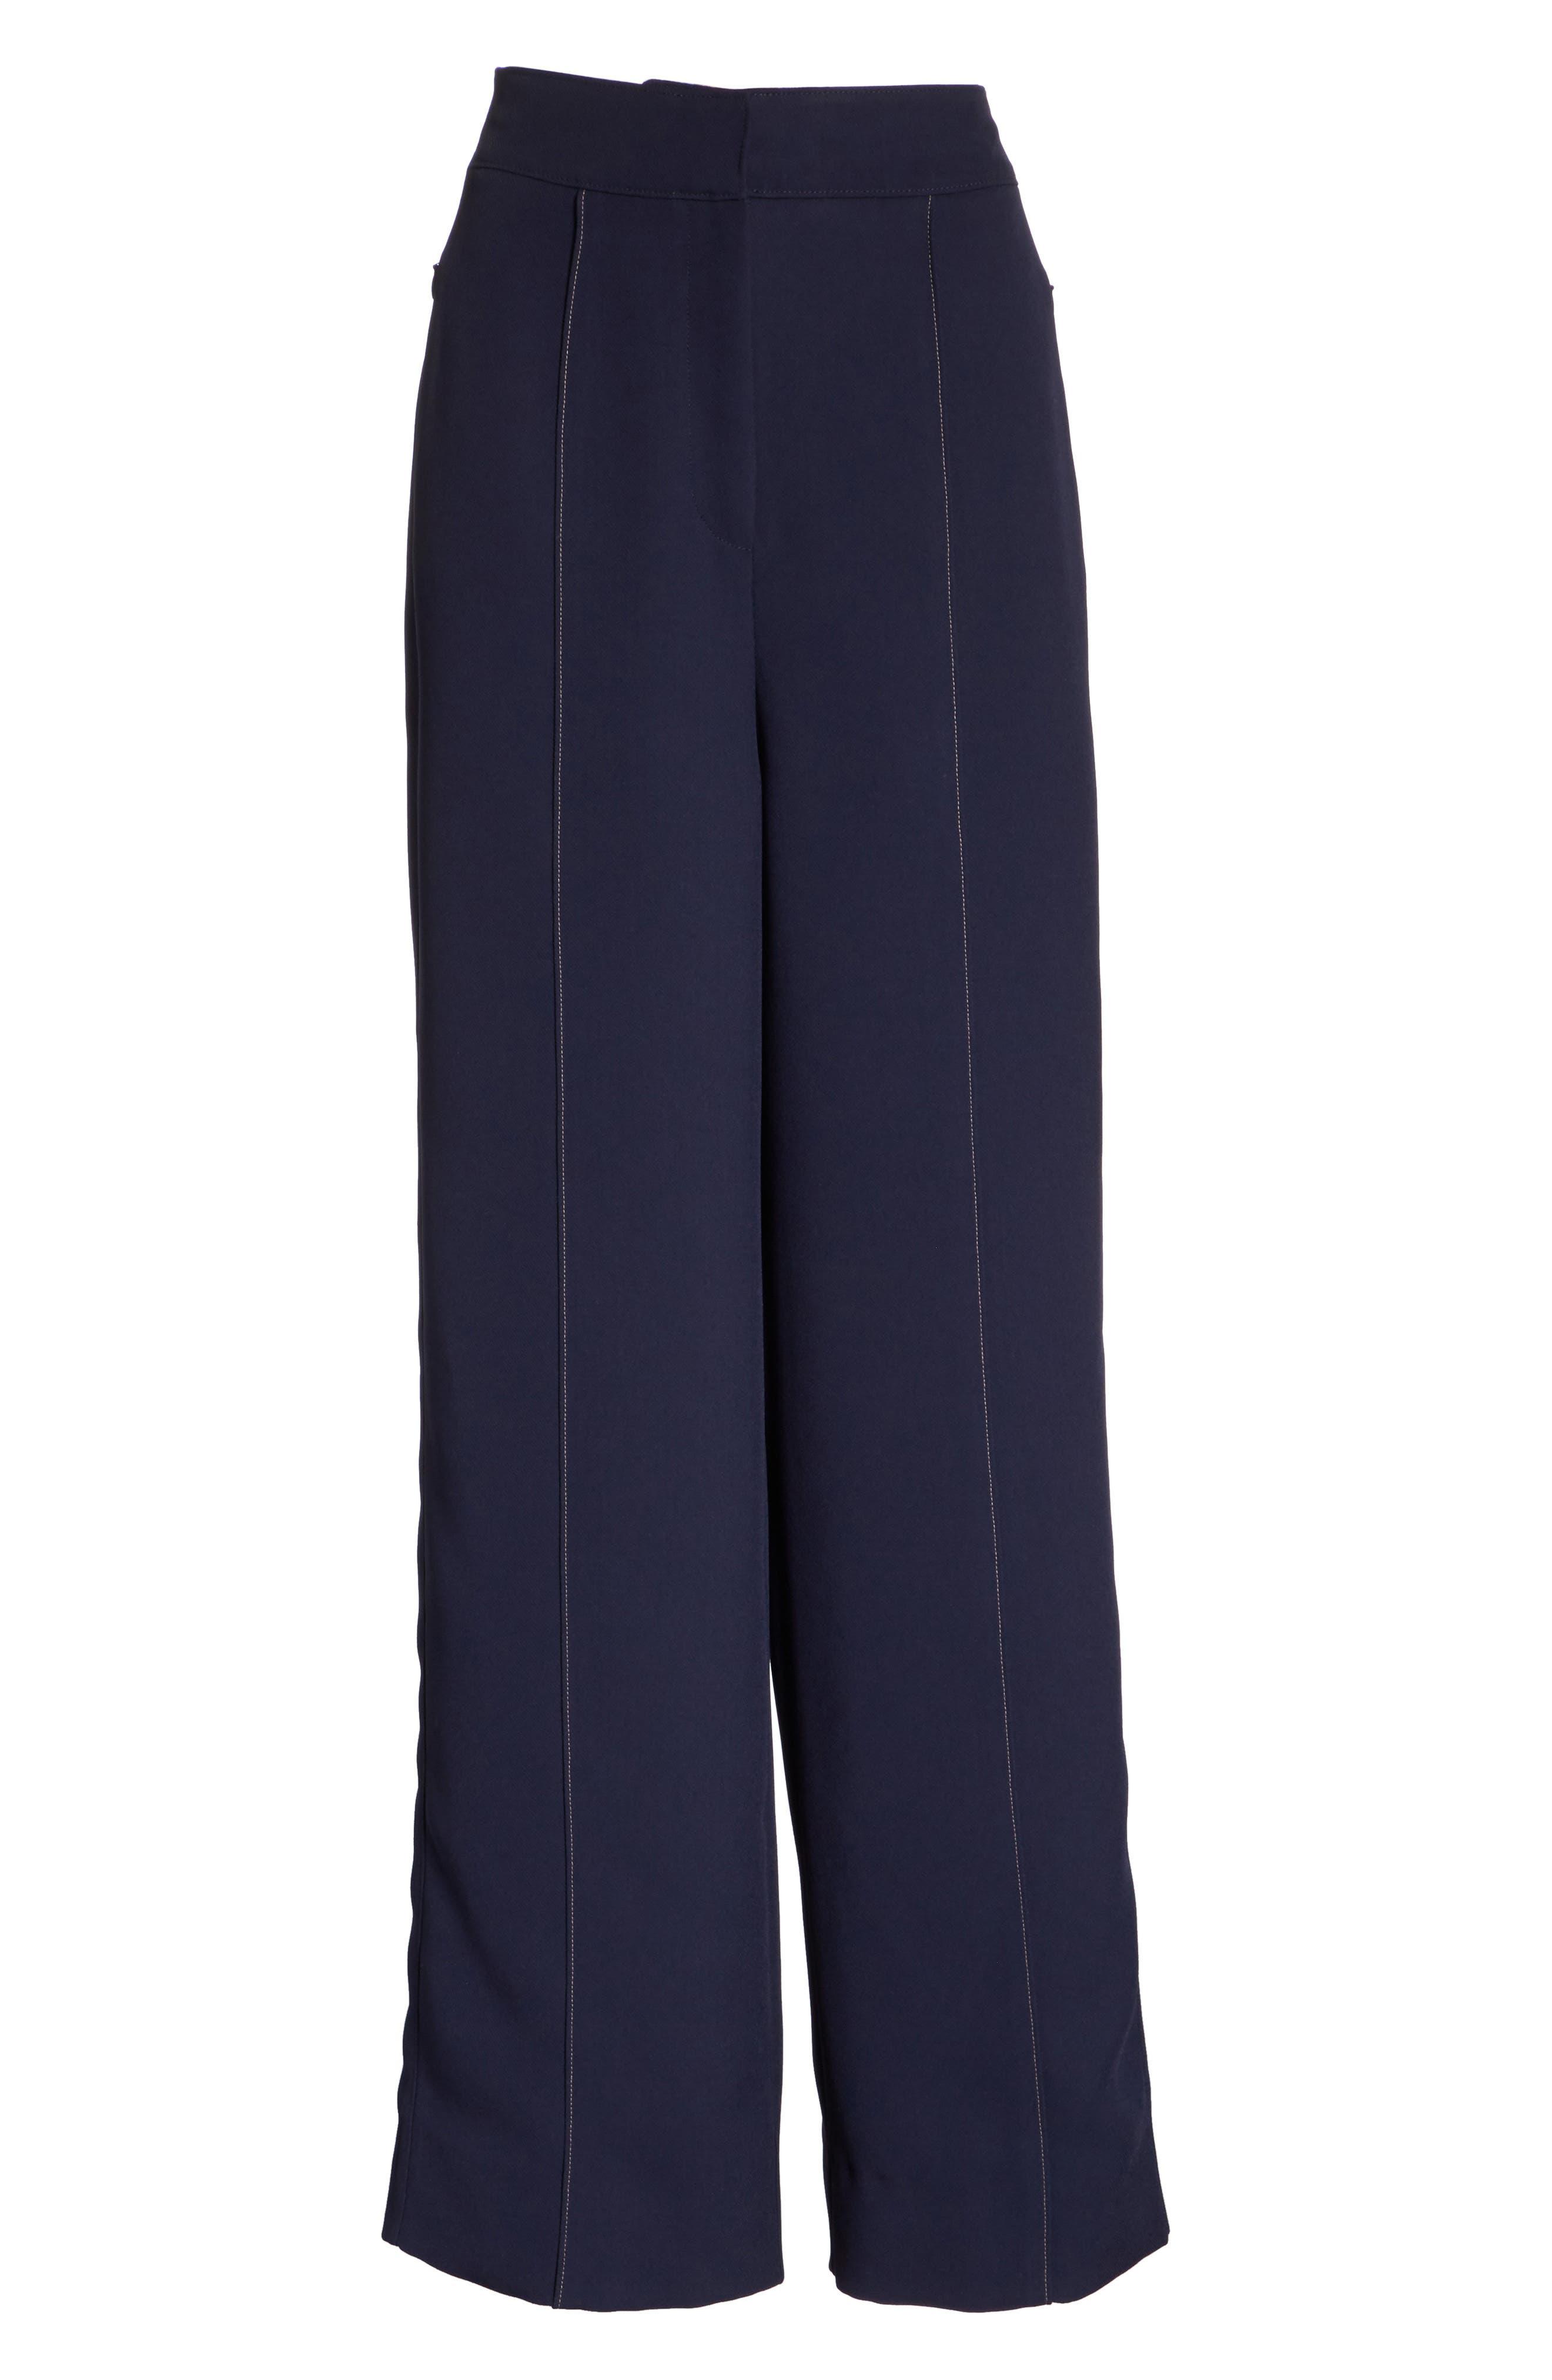 Lapari Pintuck Trousers,                             Alternate thumbnail 6, color,                             400